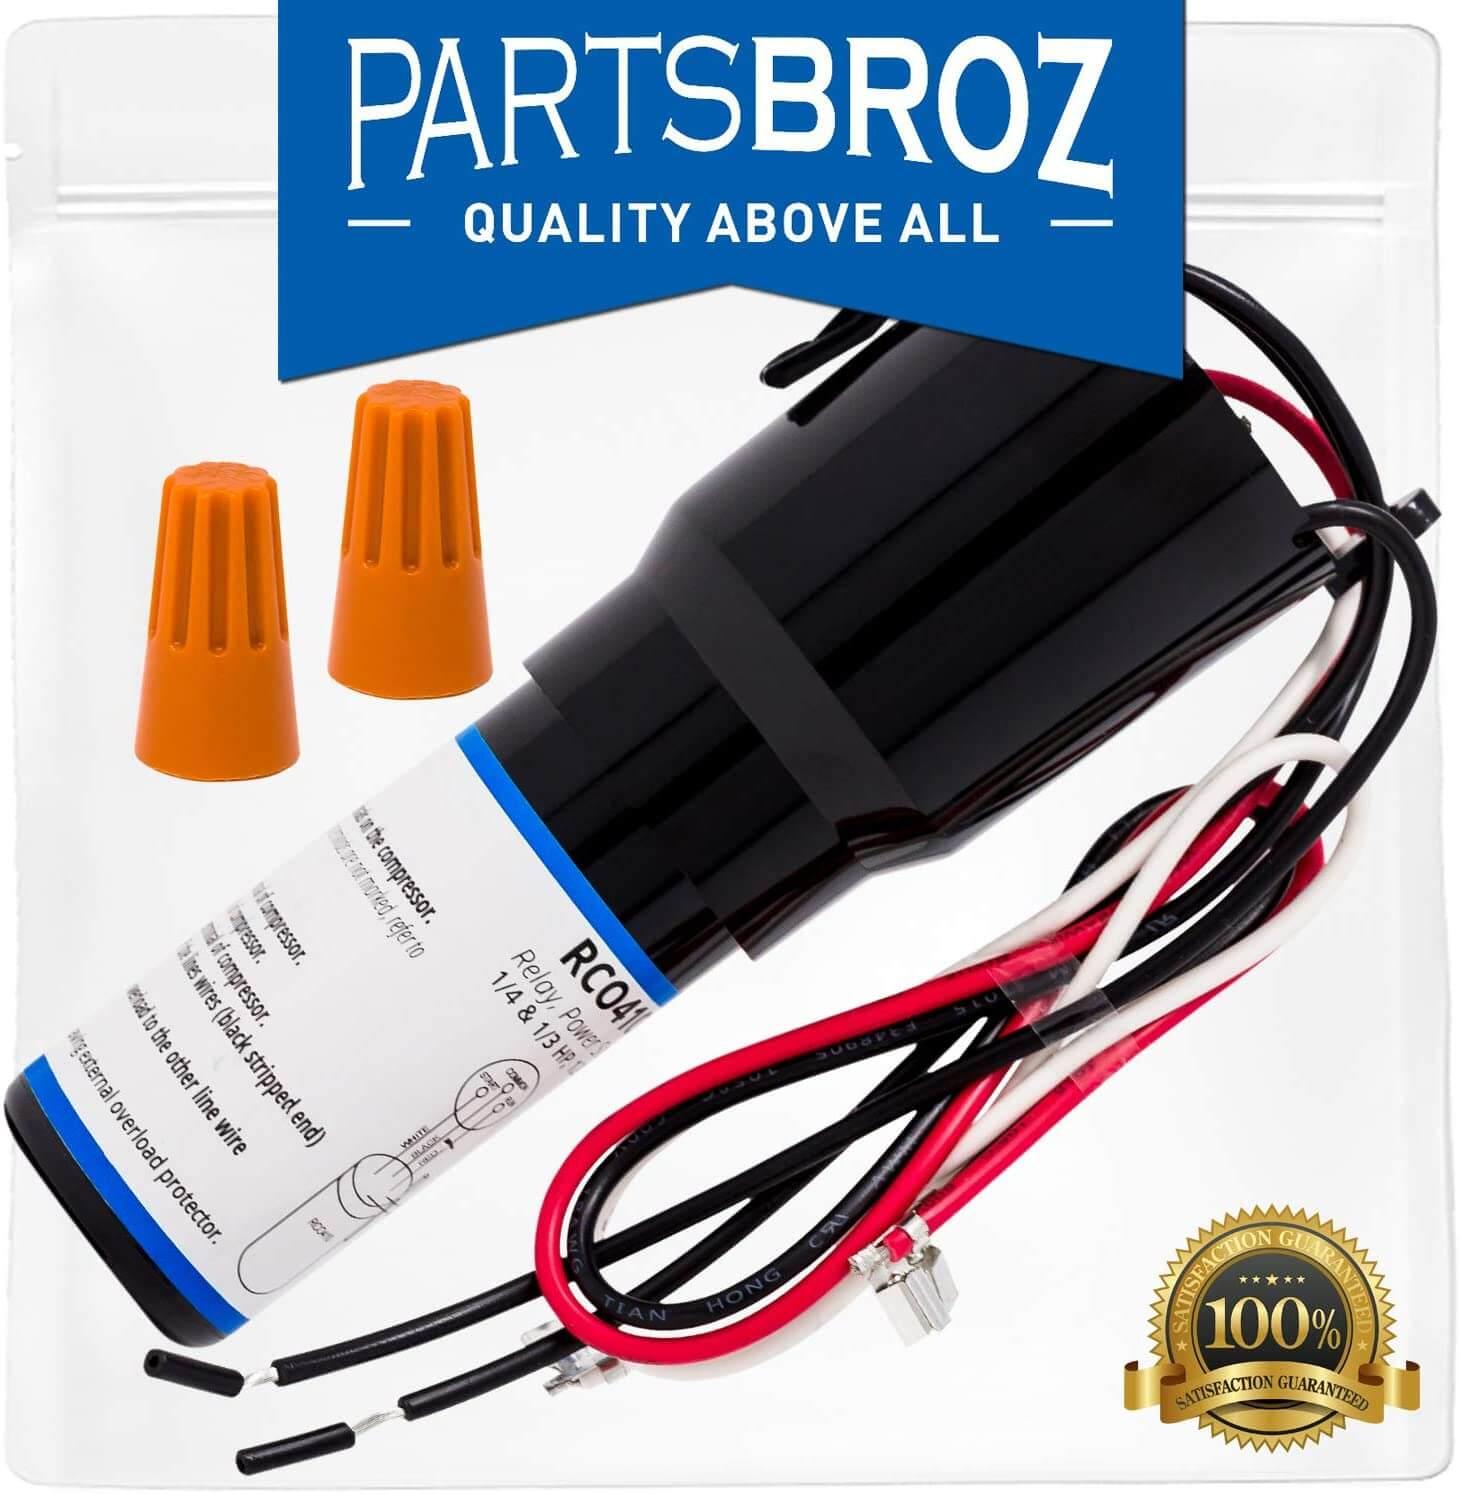 PartsBroz RCO410